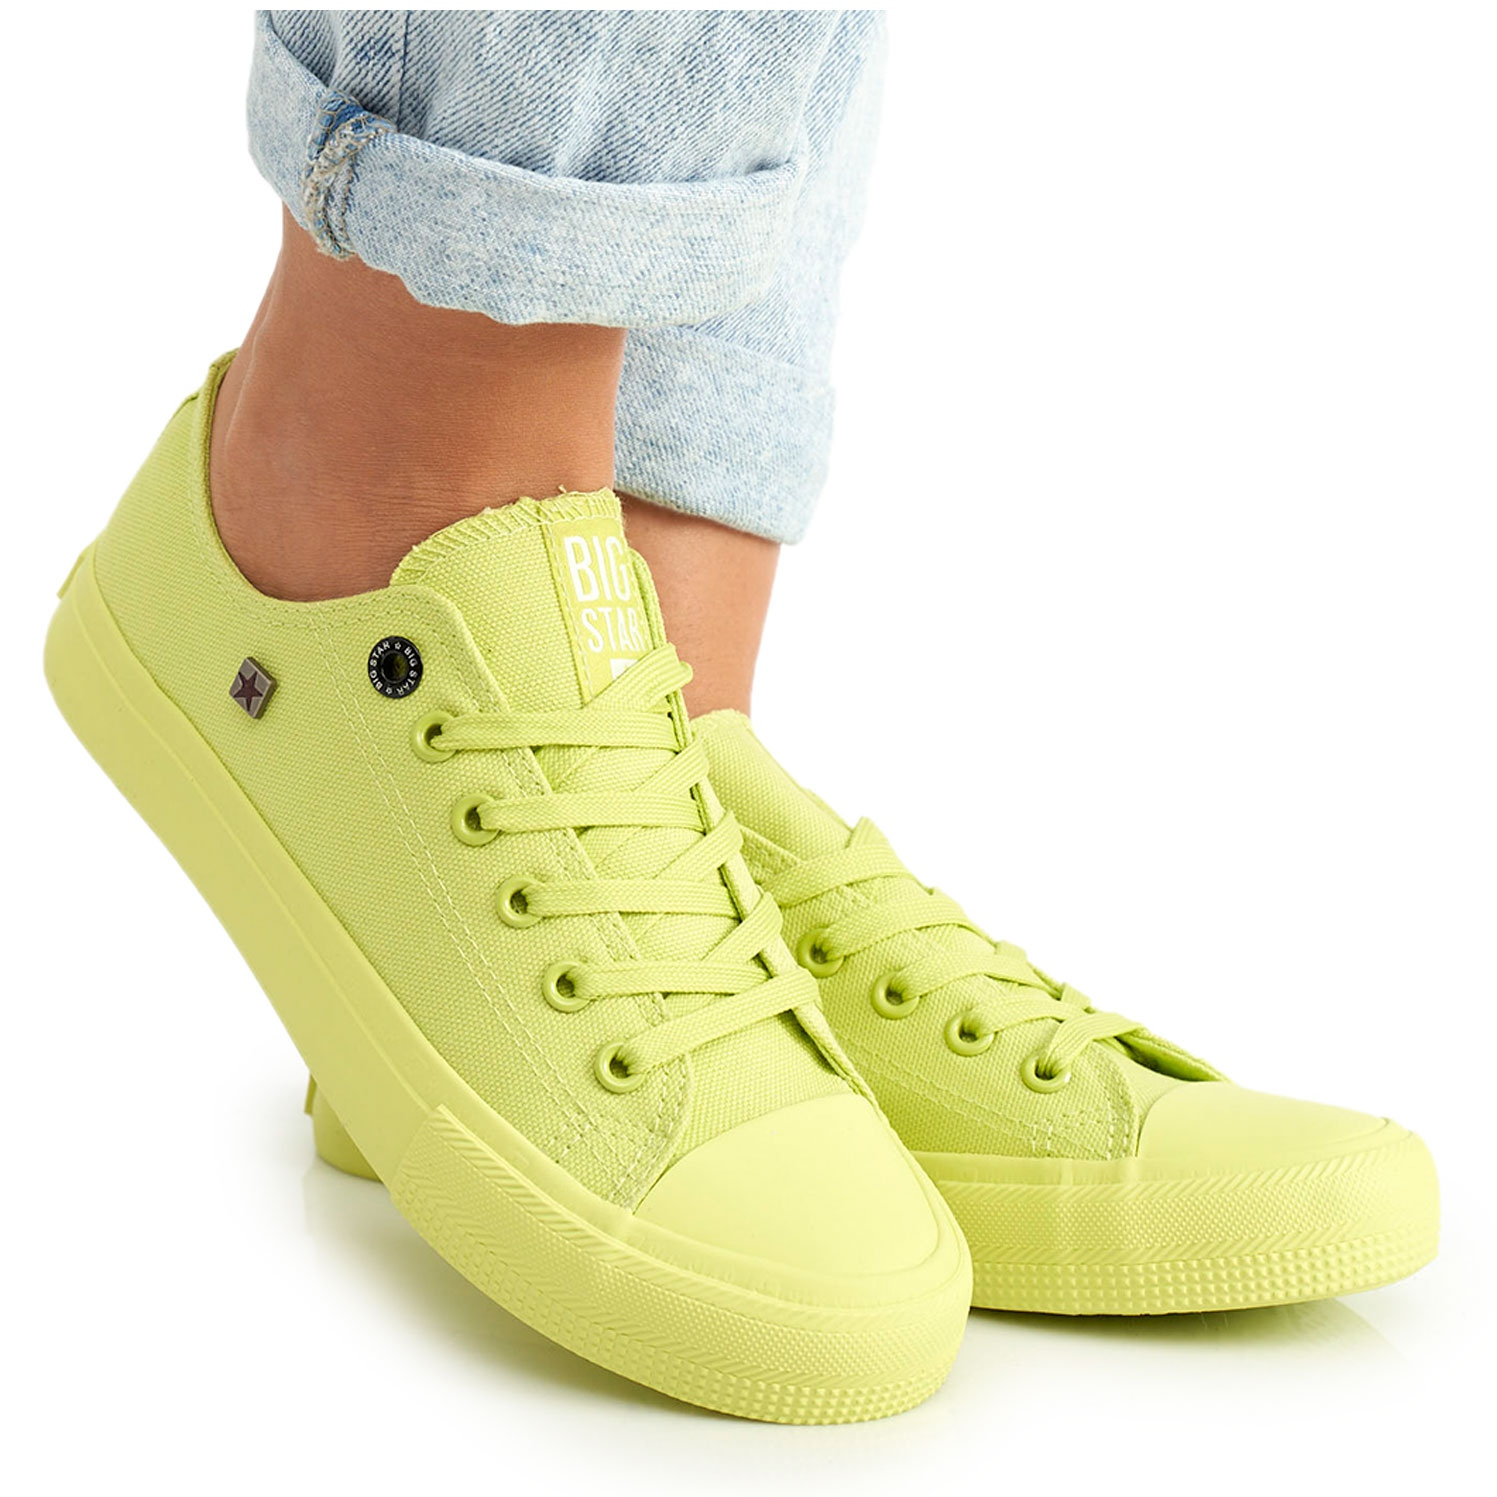 Women's Big Star Lime Sneakers AA274012